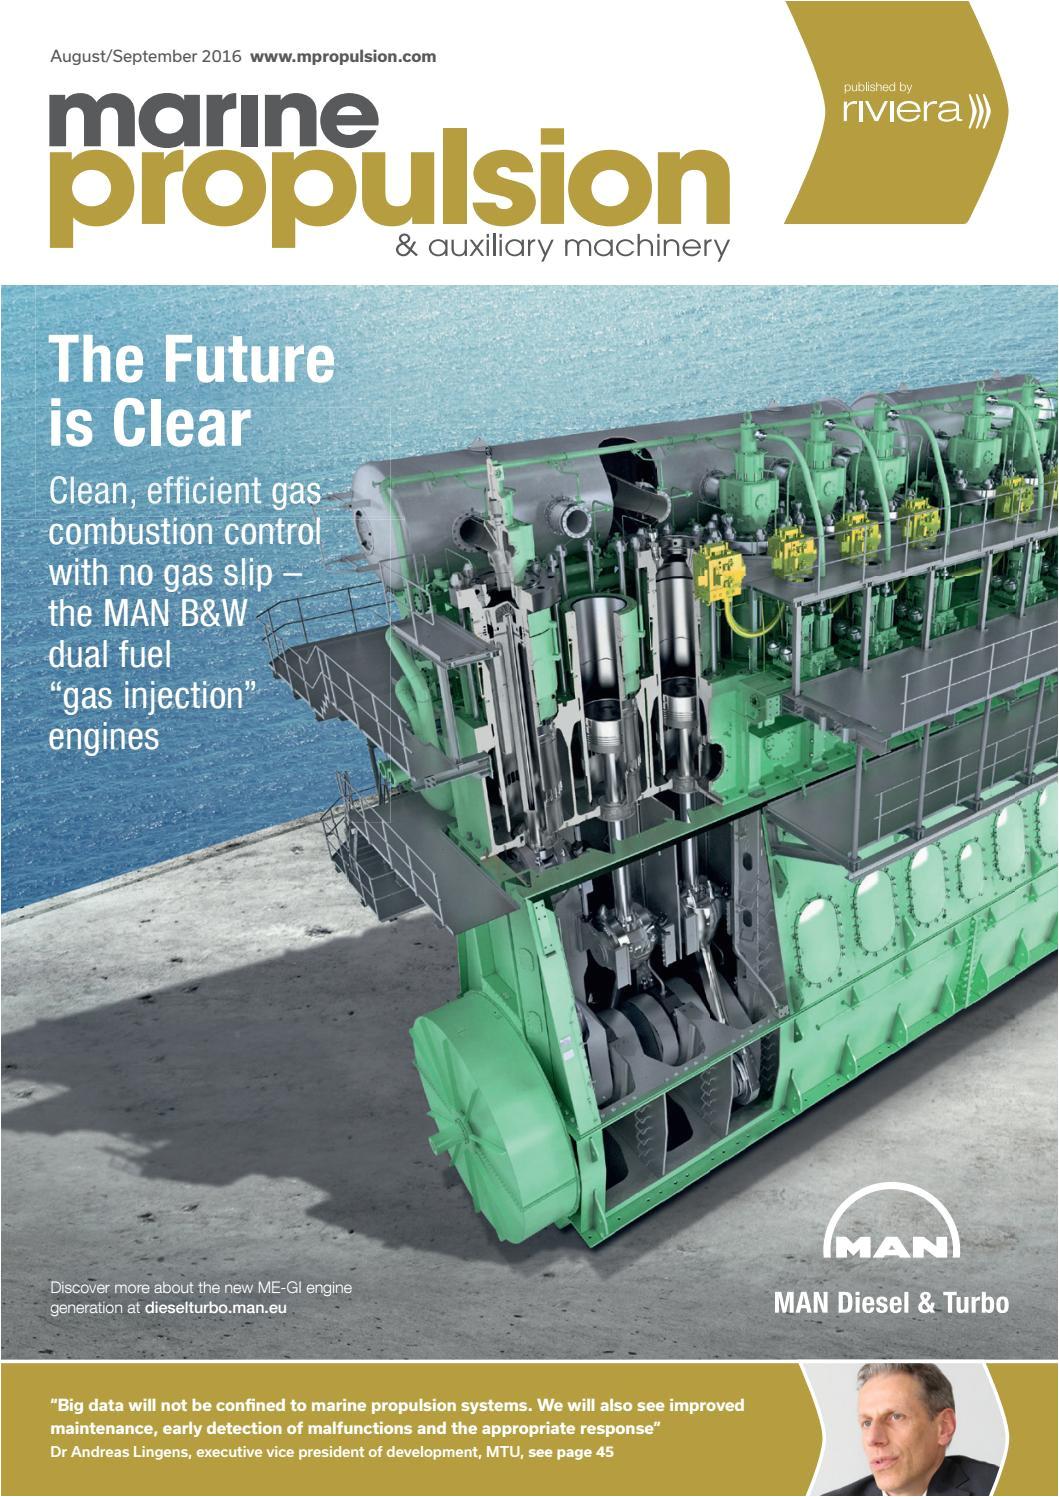 marine propulsion auxiliary machinery aug sep16 by rivieramaritimemedia issuu